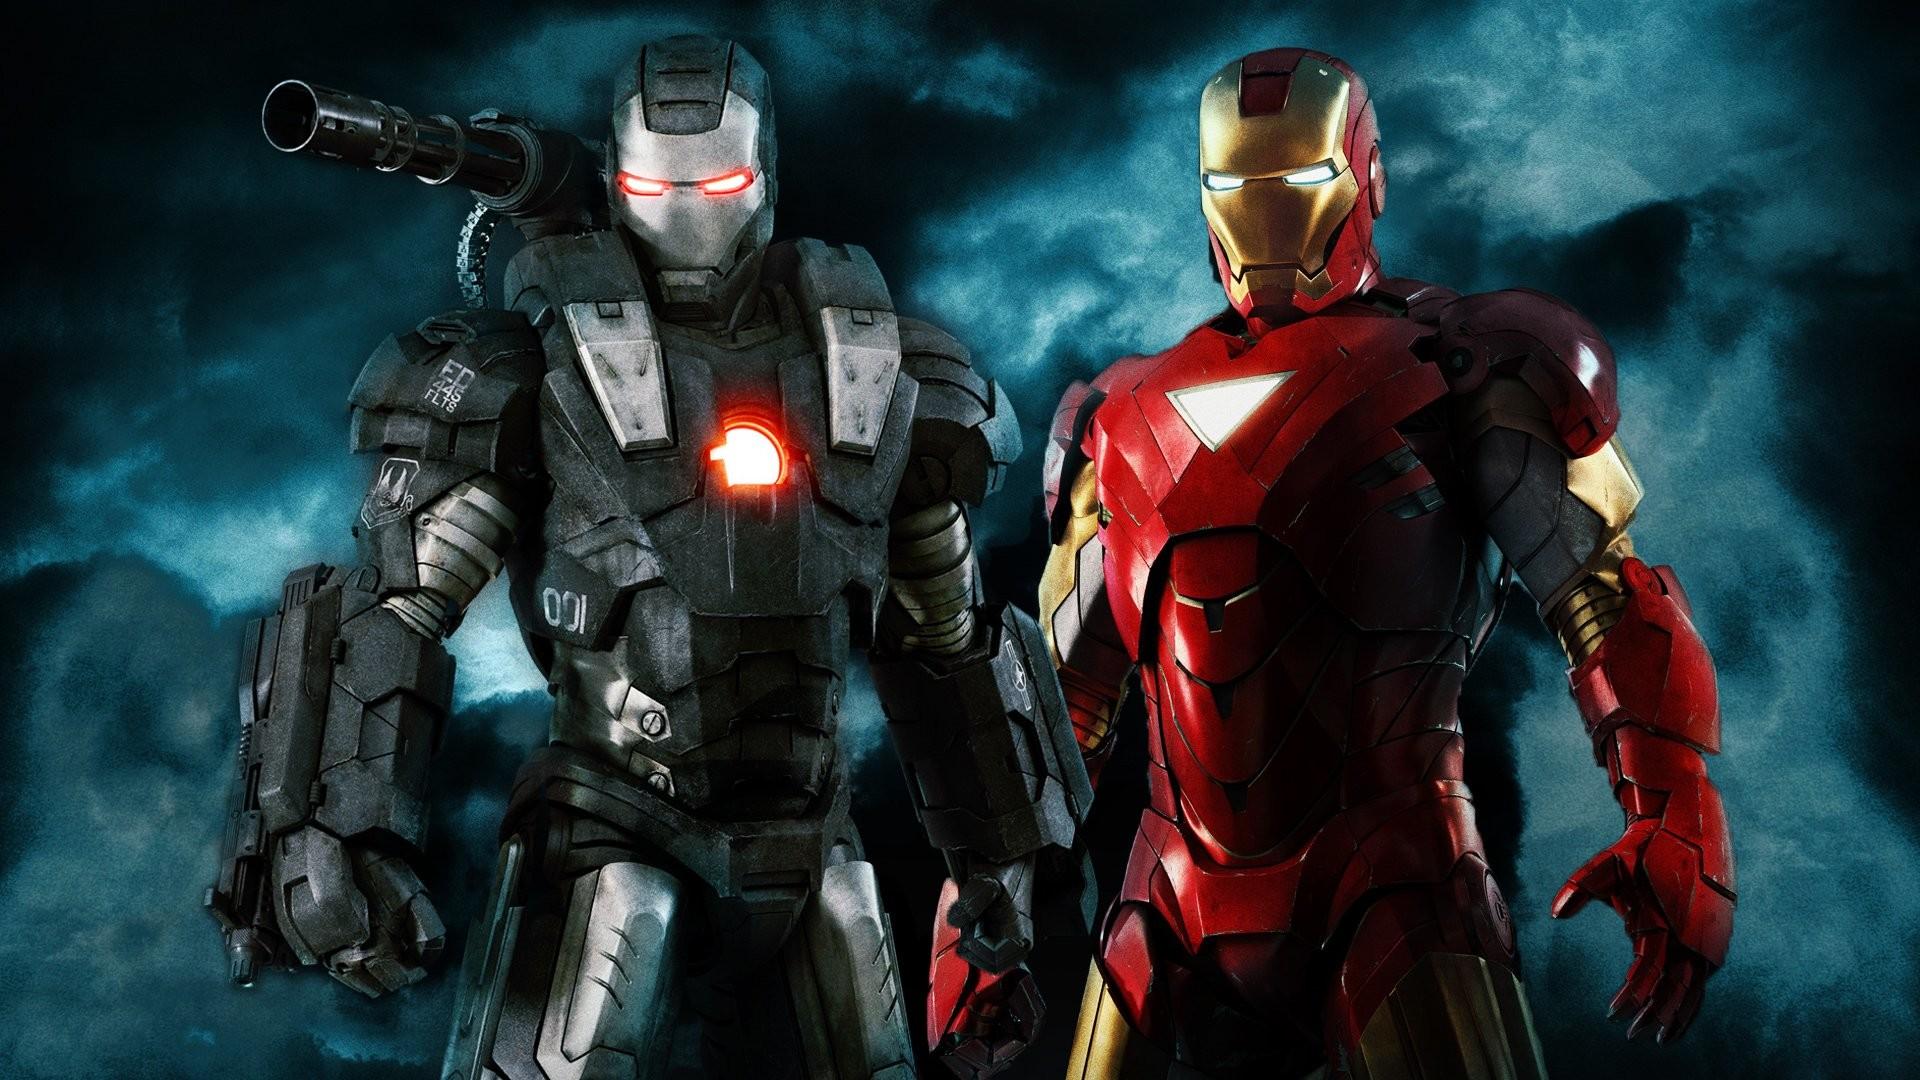 Iron Man 2 Wallpaper Hd Wallpapertag